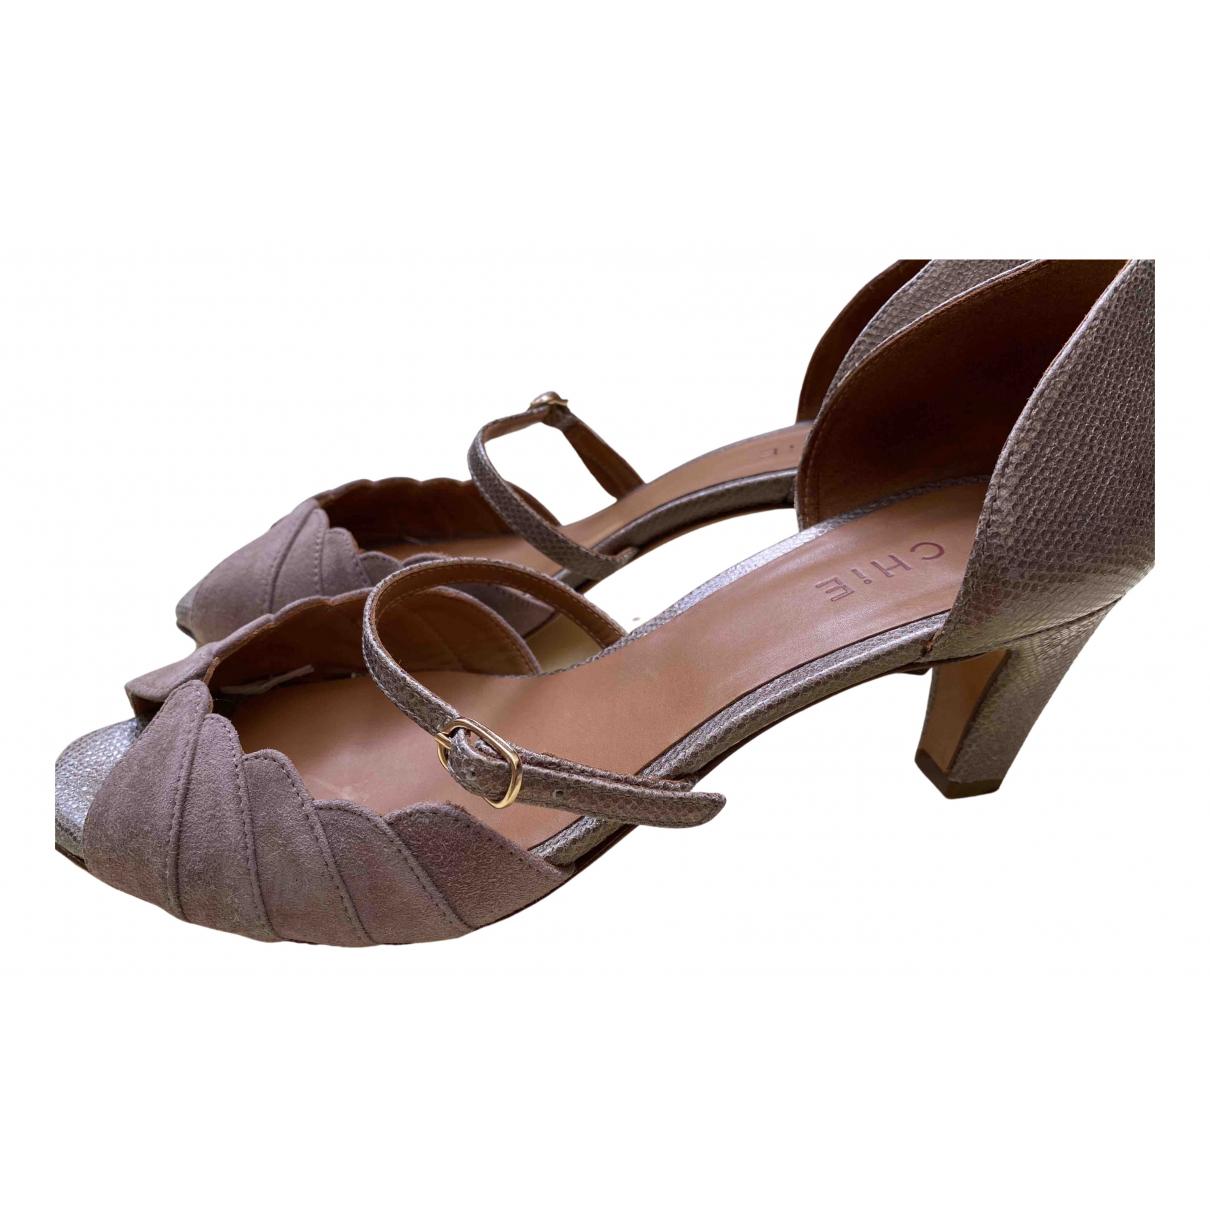 Chie Mihara N Beige Leather Heels for Women 38 EU